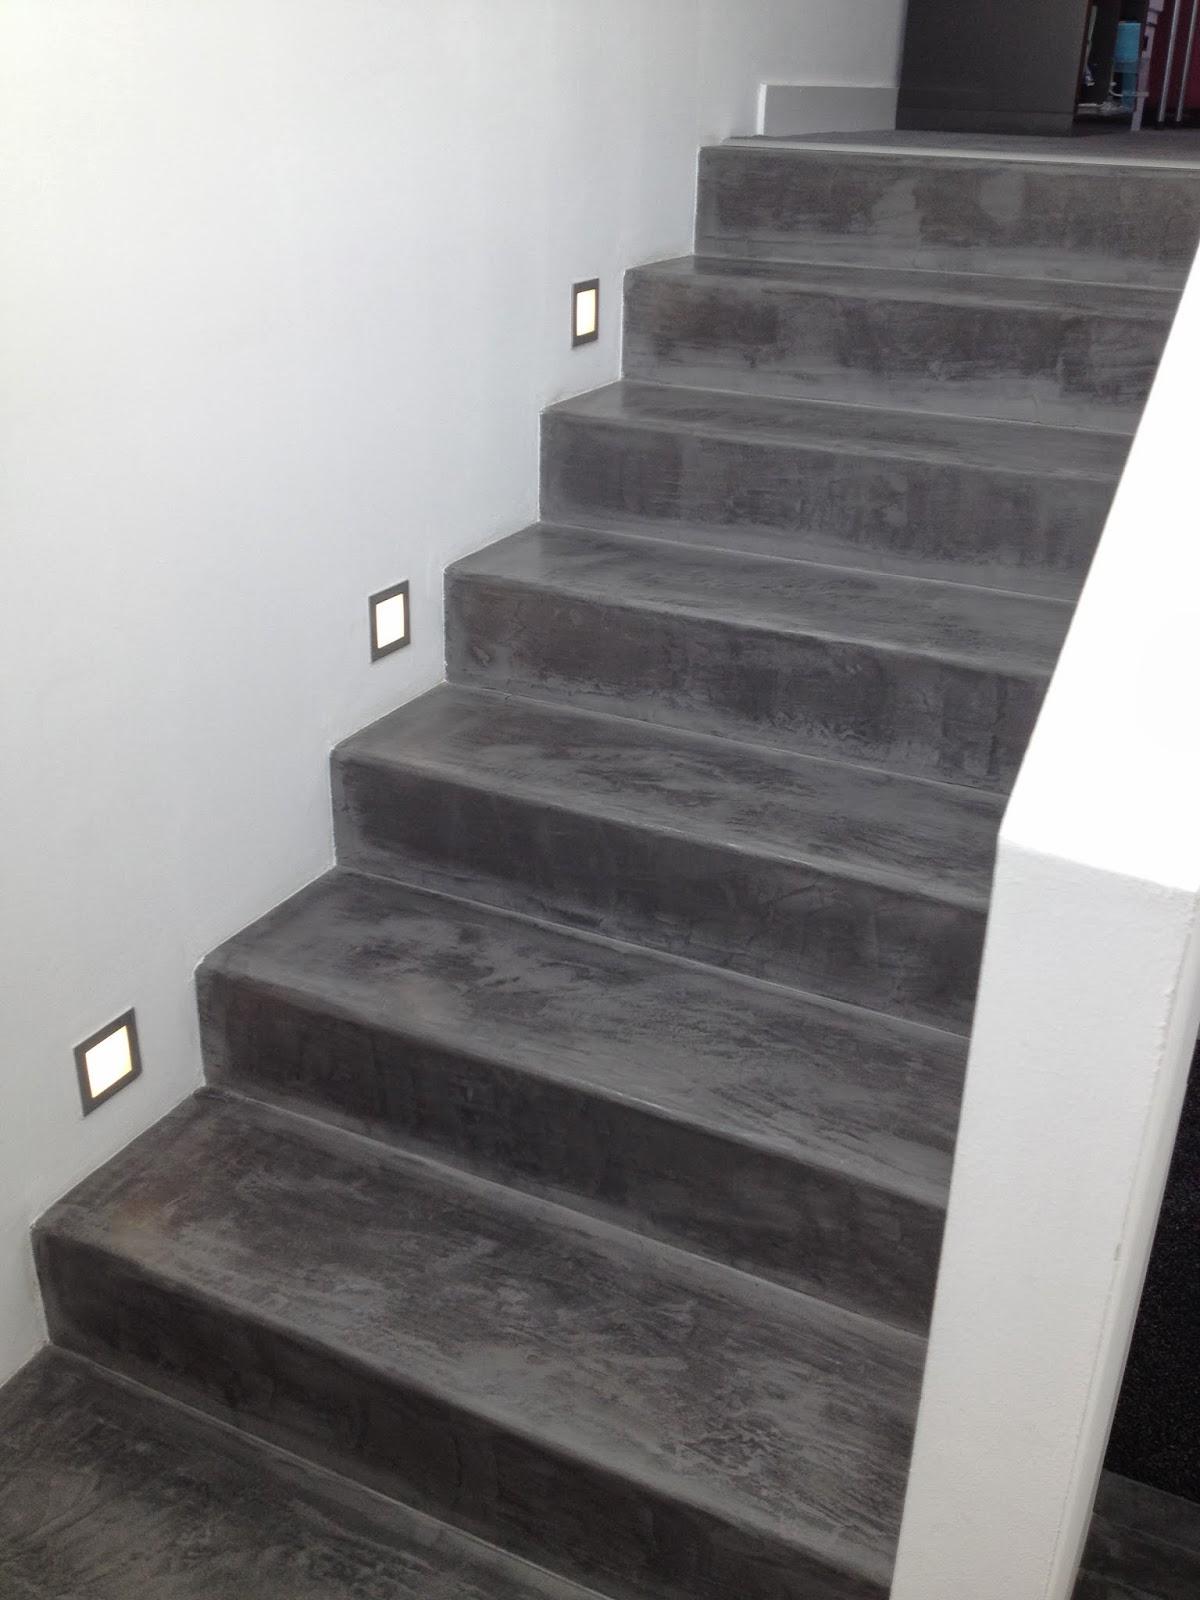 deco escalier beton gallery of escalier bton teint with deco escalier beton good renovation. Black Bedroom Furniture Sets. Home Design Ideas